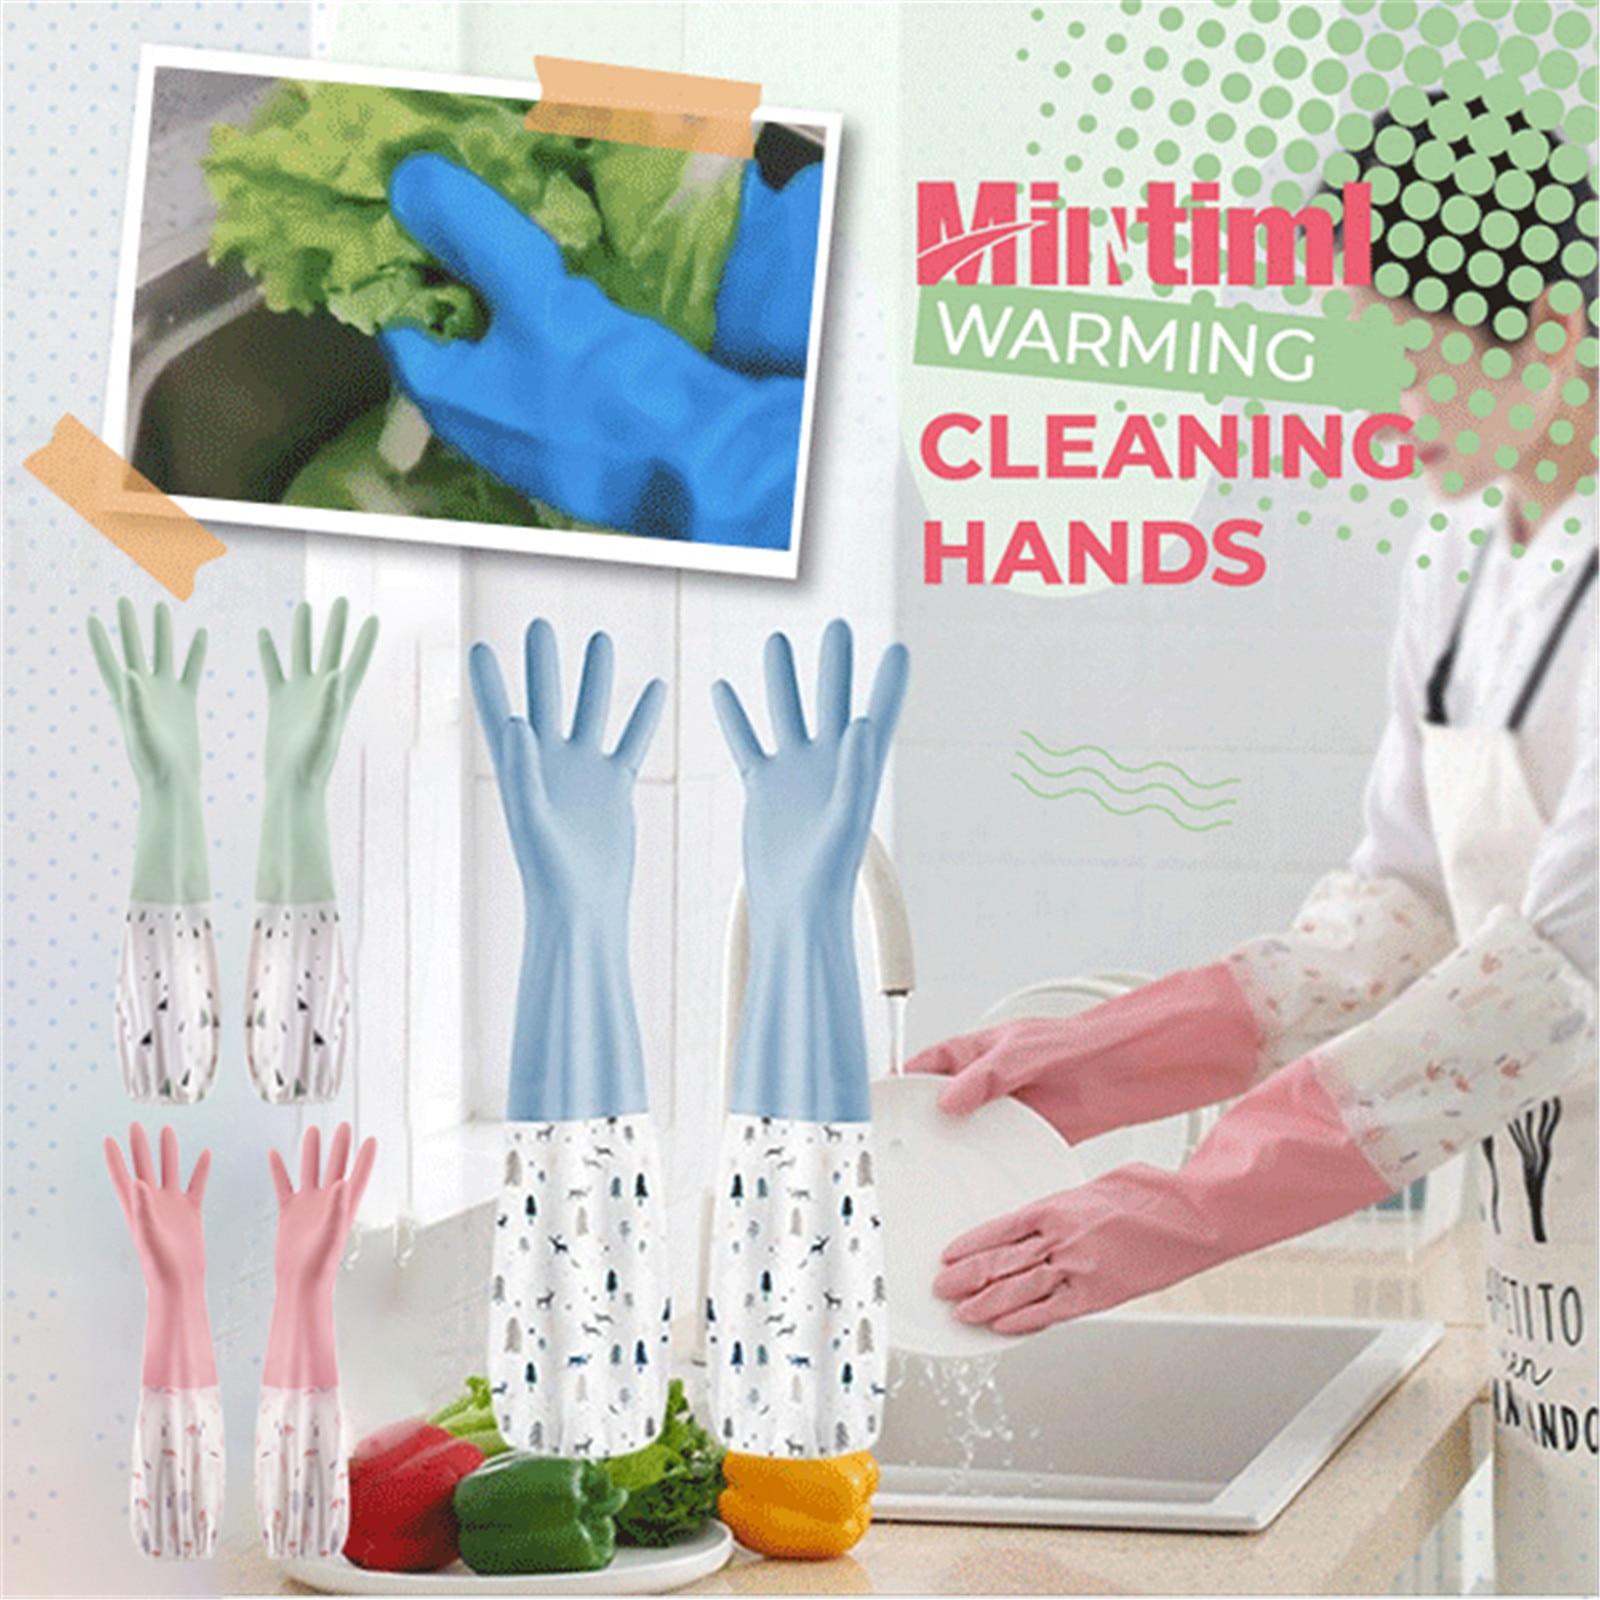 Luva longa lavar pratos luvas de limpeza doméstica cozinha à prova dwaterproof água dishwashing luvas bandas de borracha luvas esfrega luva